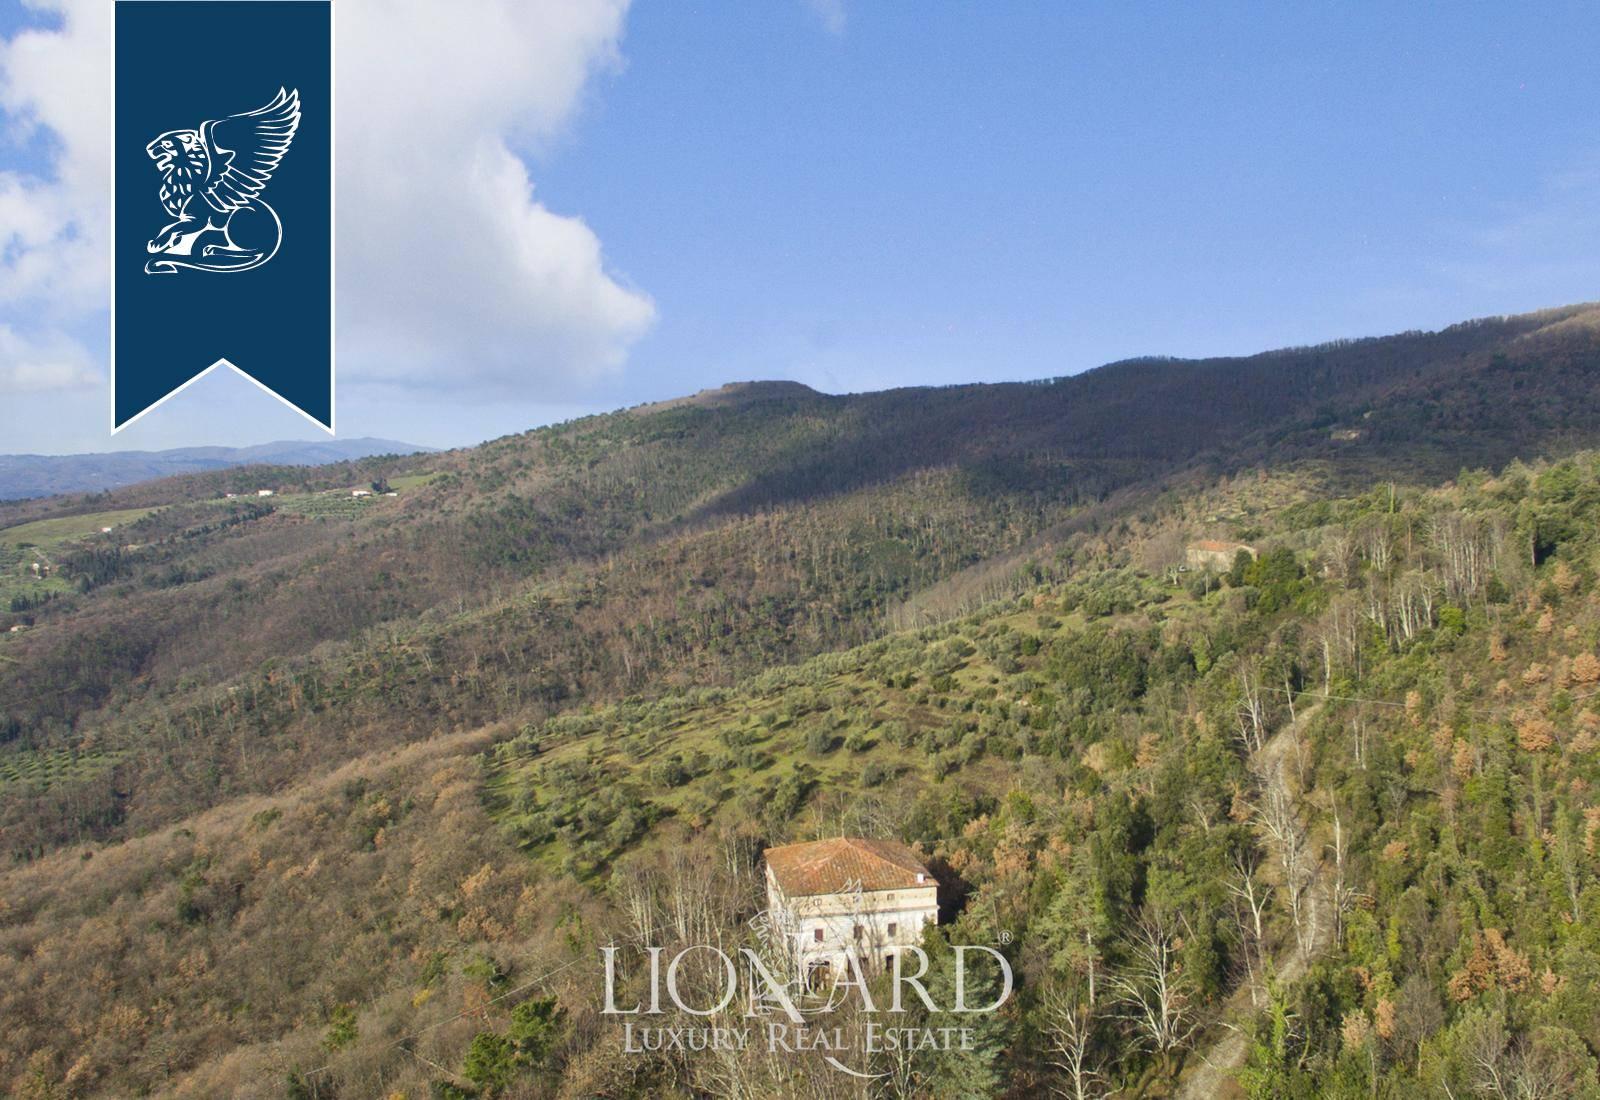 Azienda in Vendita a Montale: 0 locali, 4135 mq - Foto 8